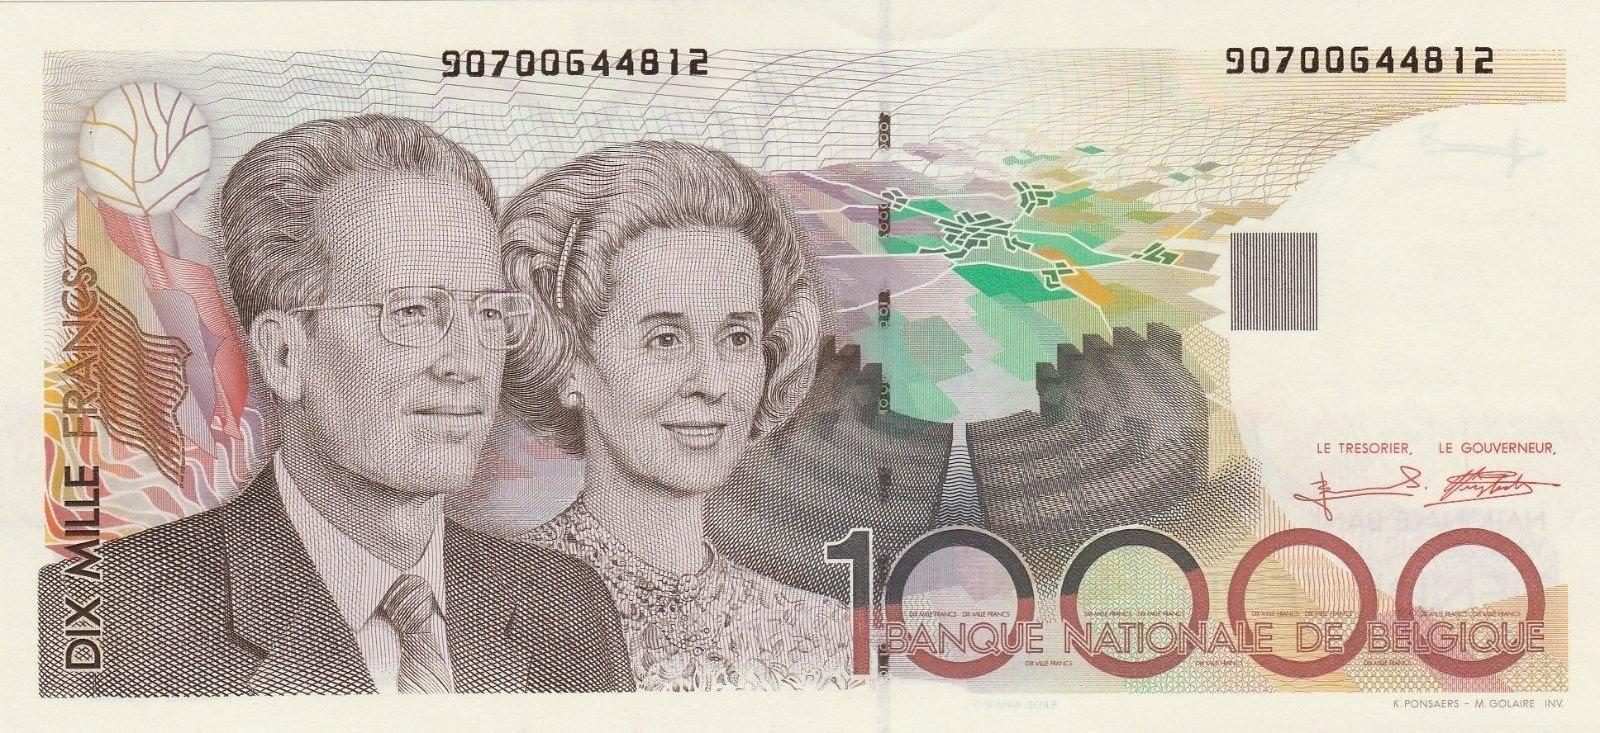 Belgium Banknotes 10000 Francs banknote 1992 King Baudouin and Queen Fabiola